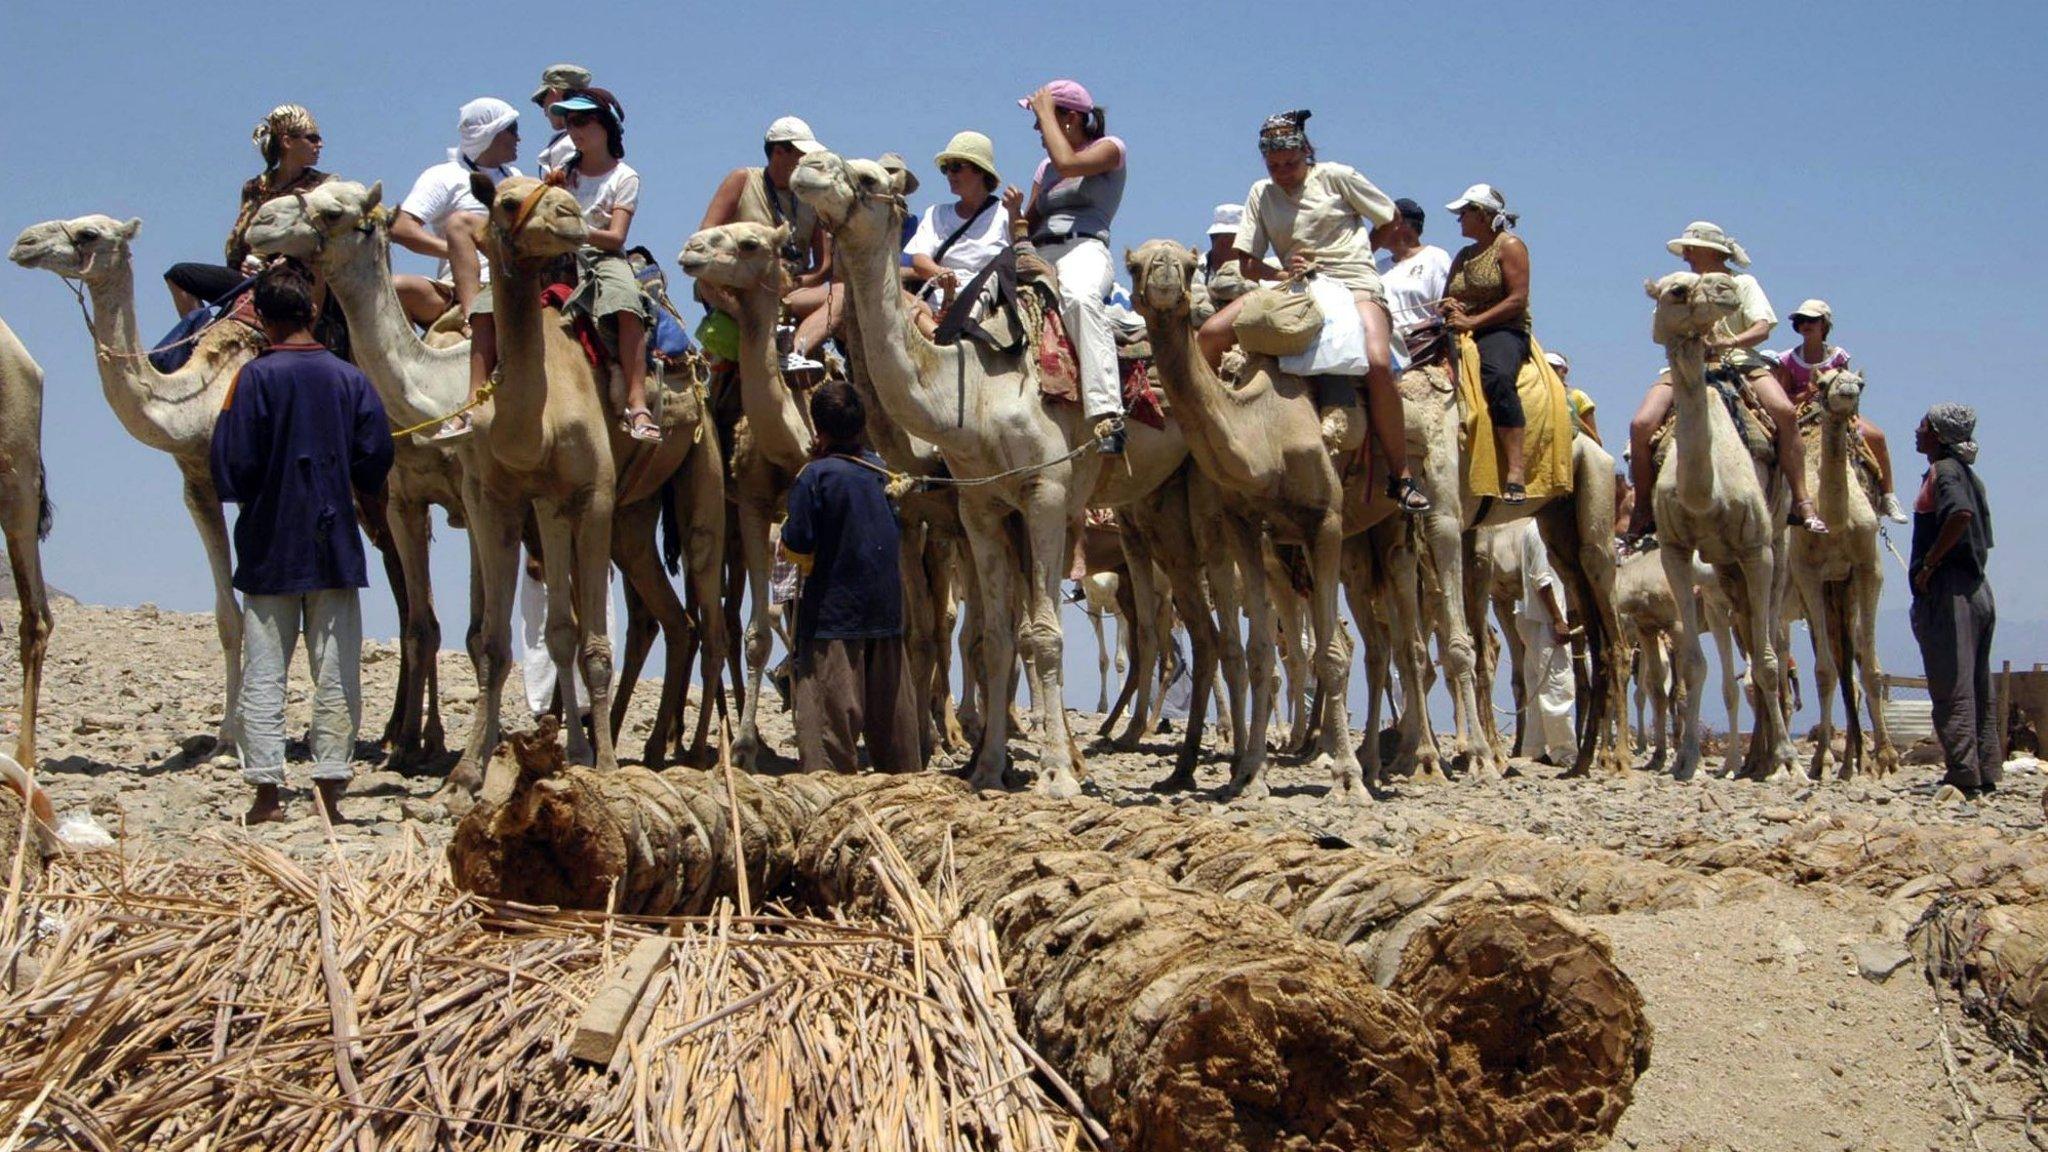 Egypt worst performer among big tourist destinations